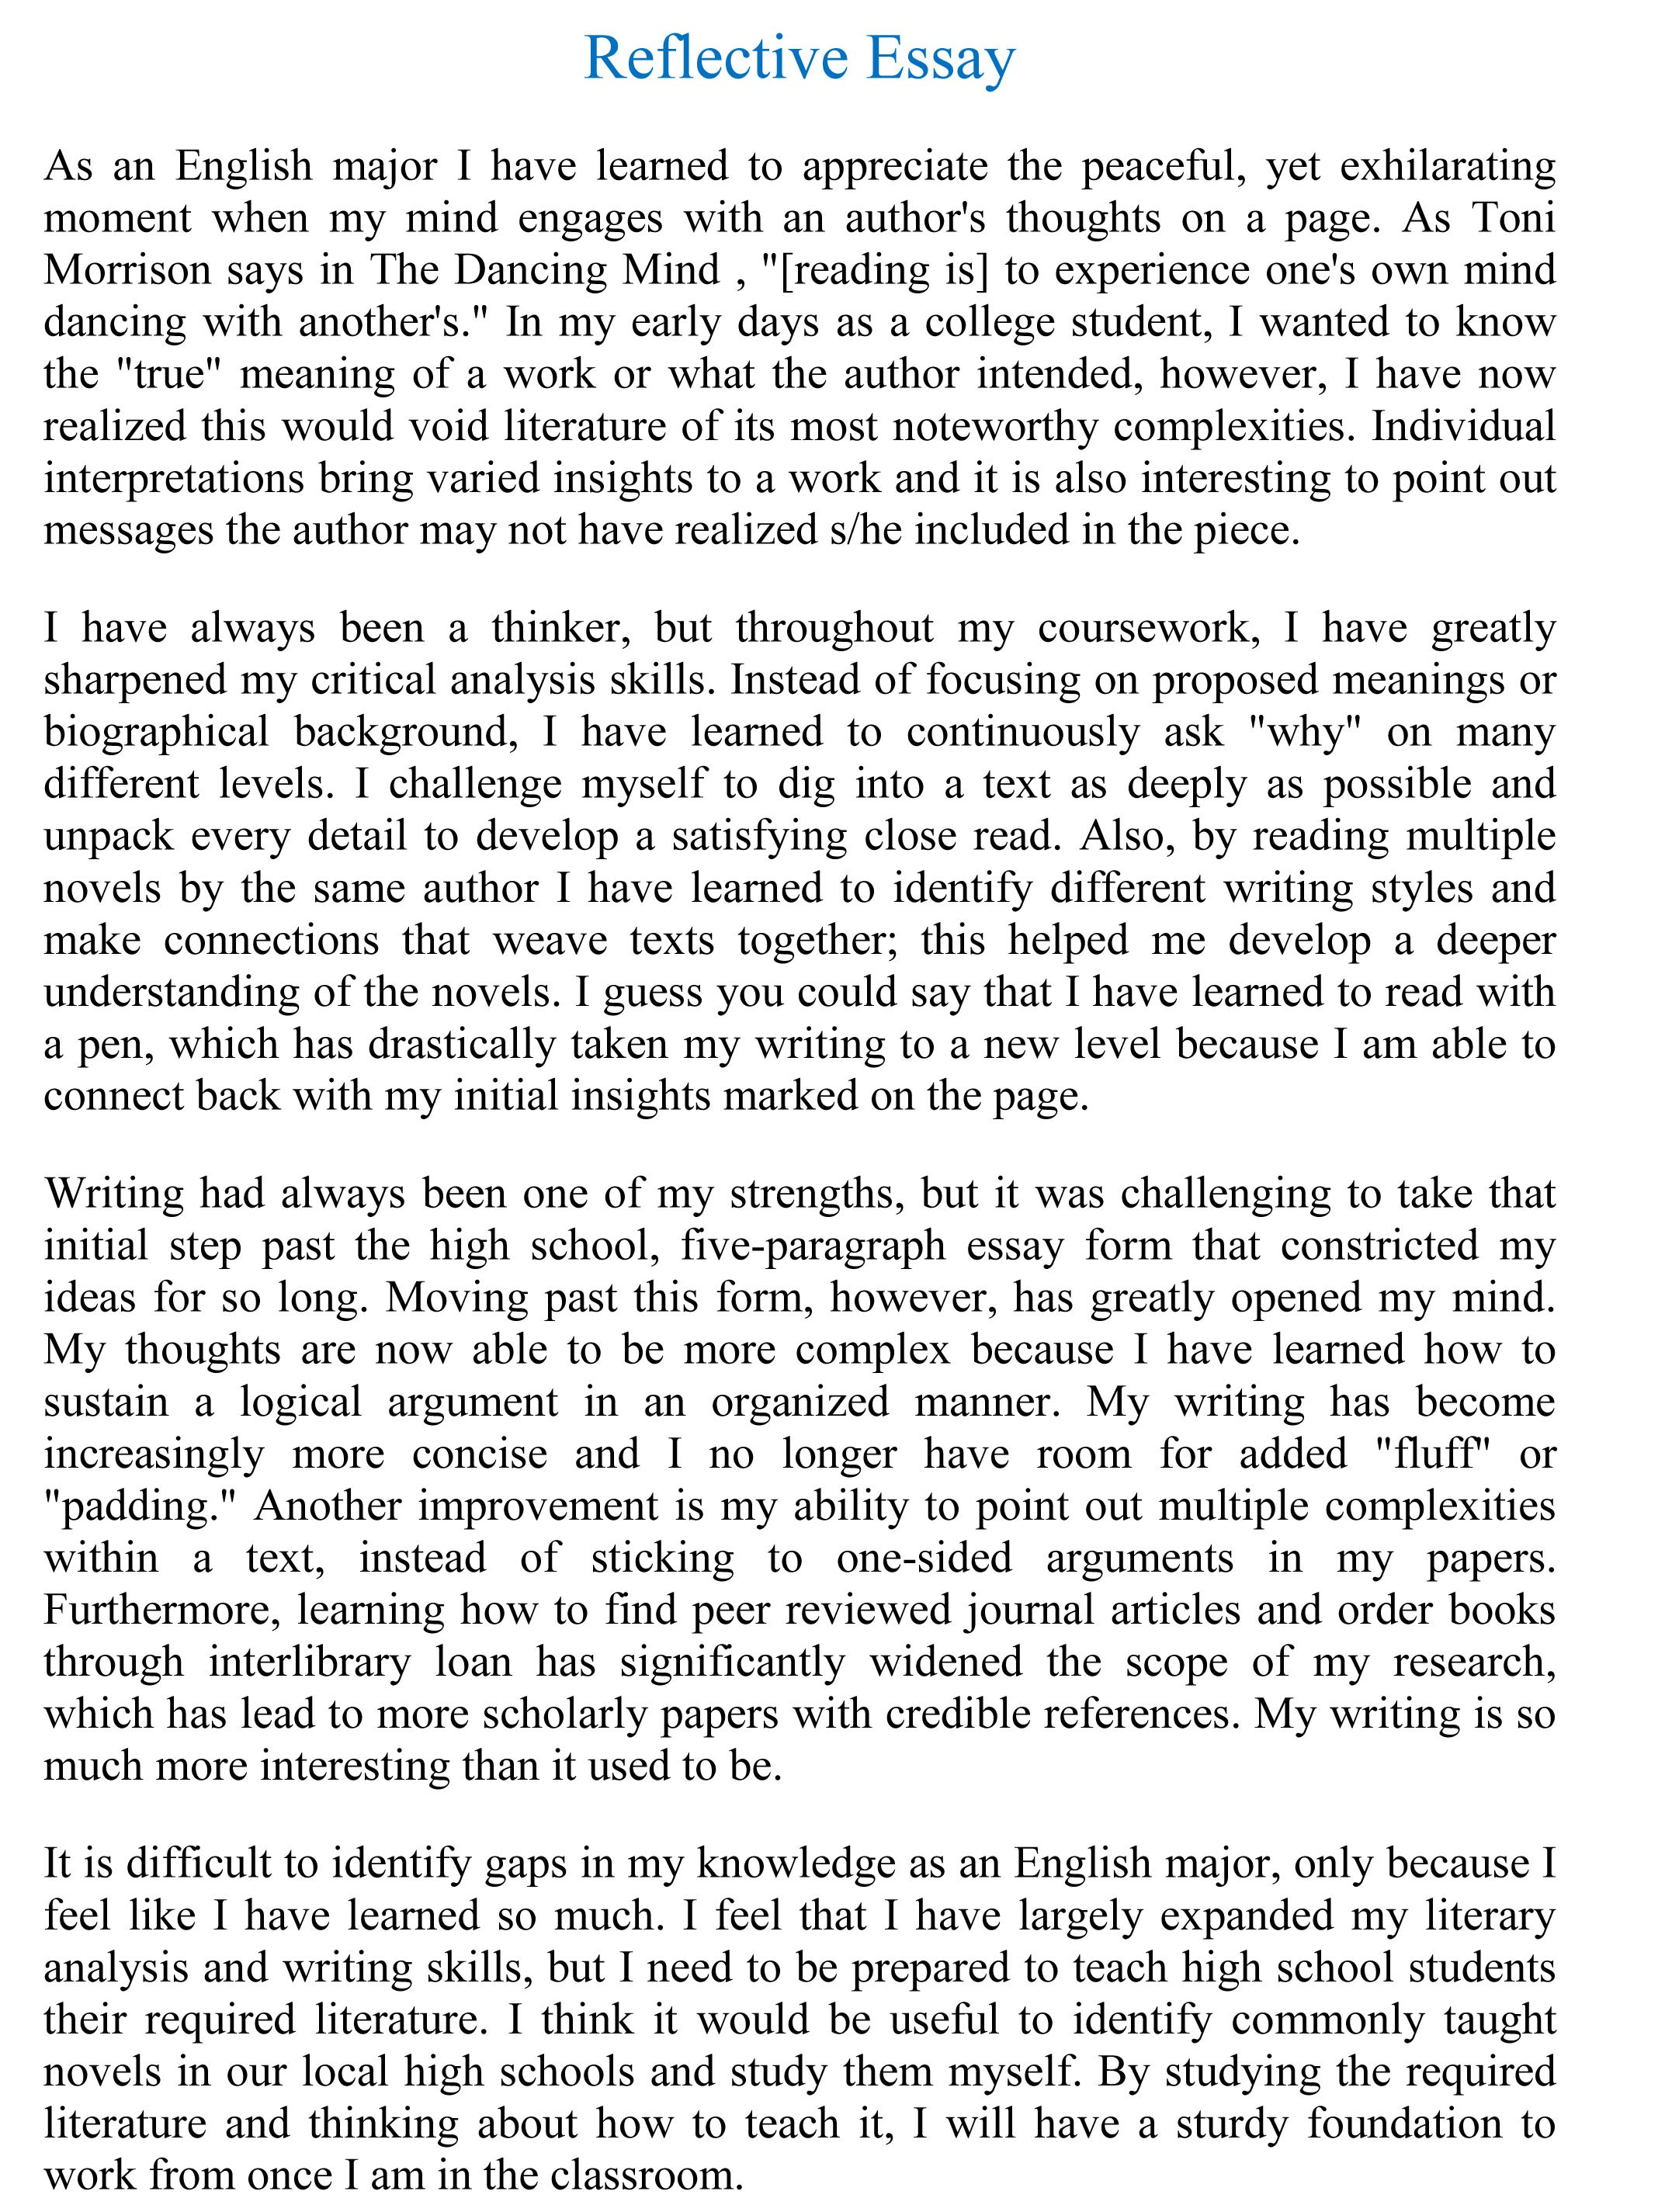 020 Resume For Nursing Internship Sle Rock Your Sles Templates Steps In Reflective Essay Example English Writing Sample Striking Essays Creative Full